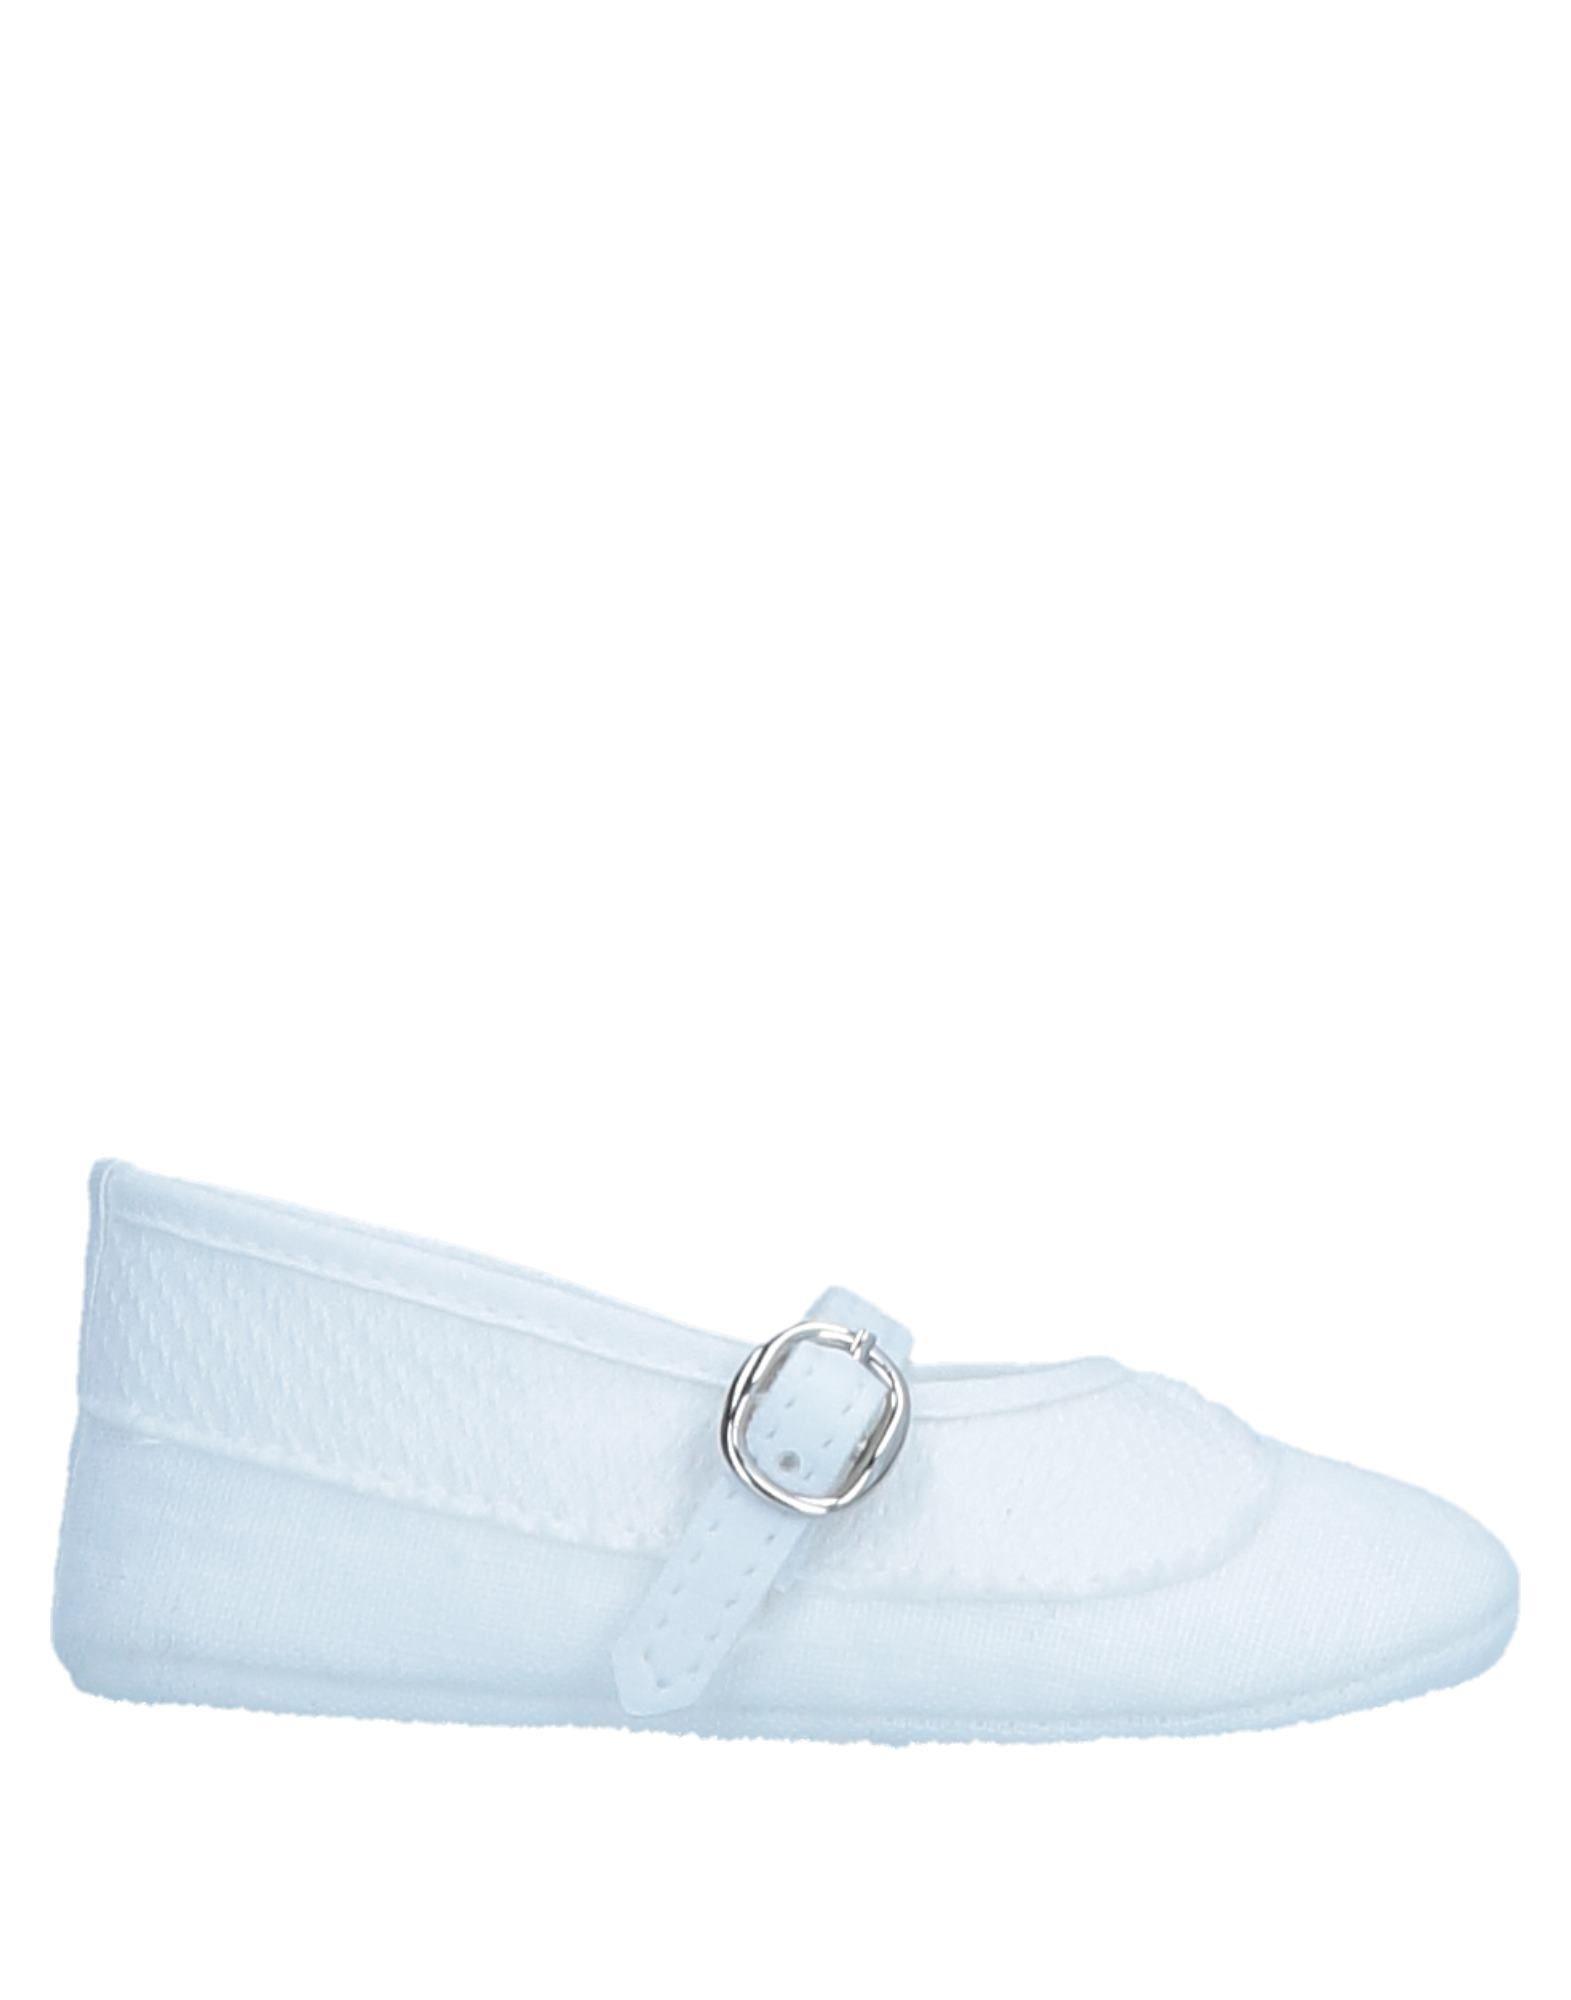 FEFÈ Обувь для новорожденных fefè боди